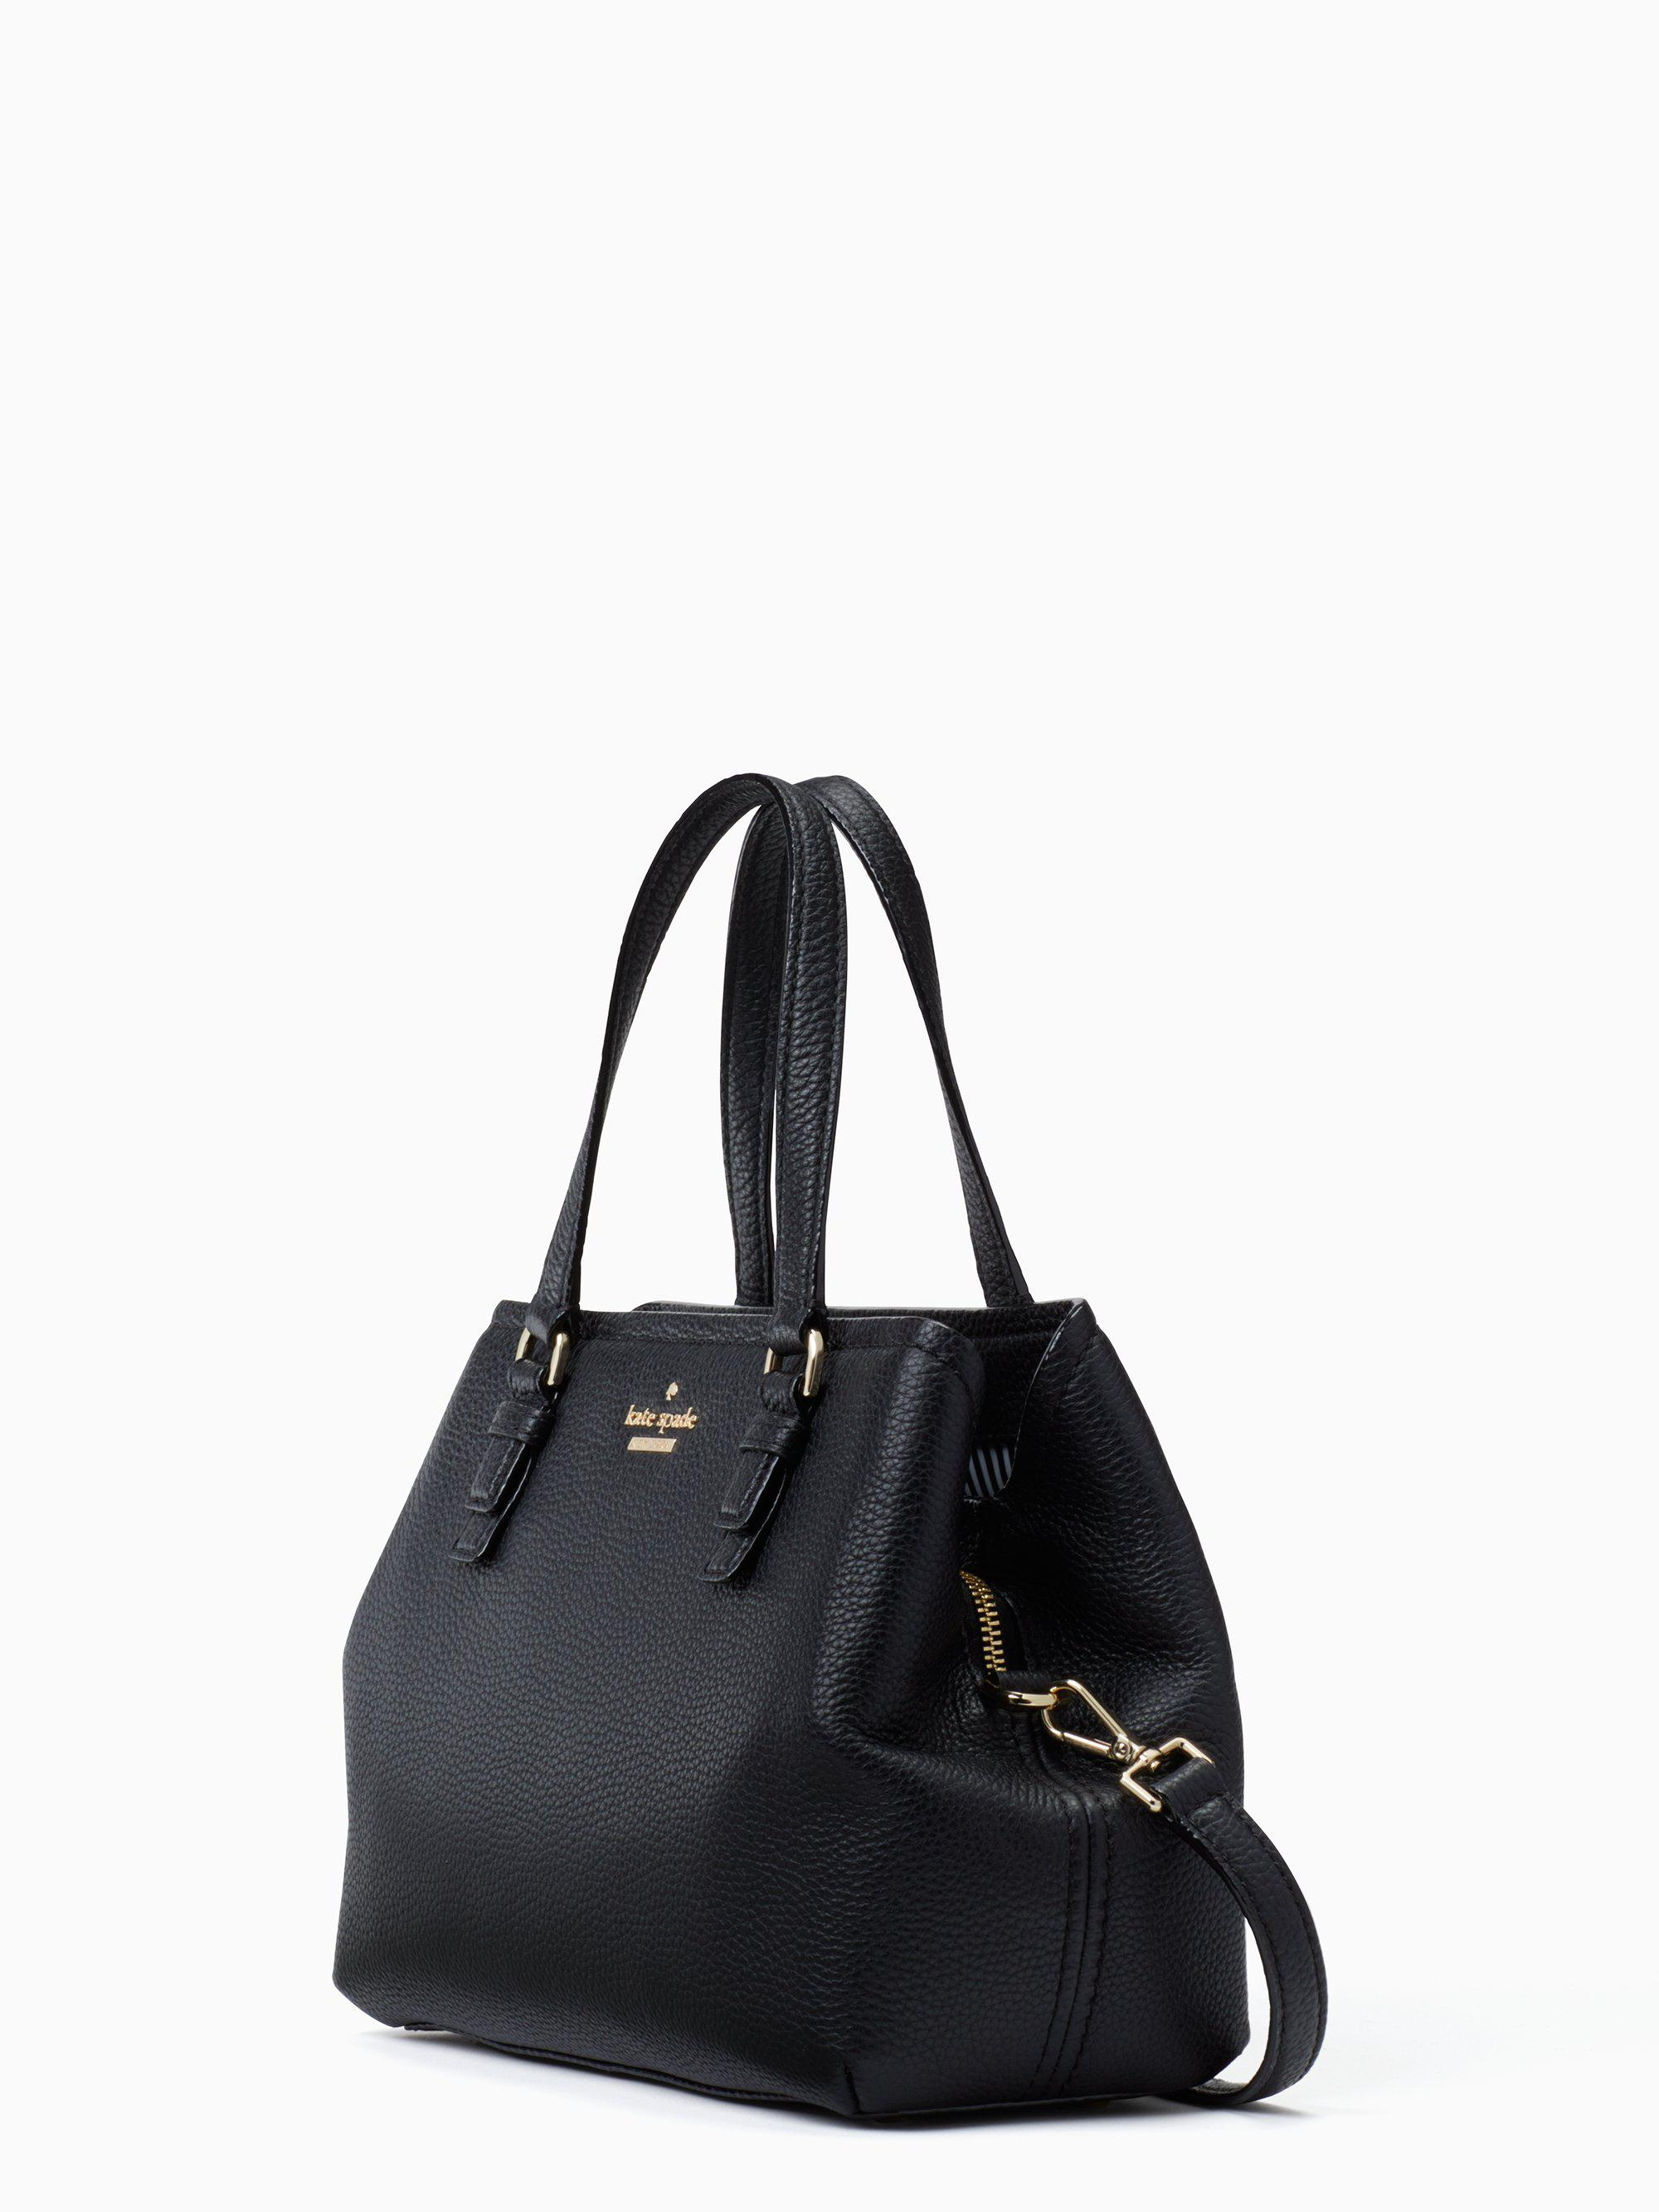 4b80568b3fd Kate Spade New York Jackson Street Small Octavia Leather Bag Women